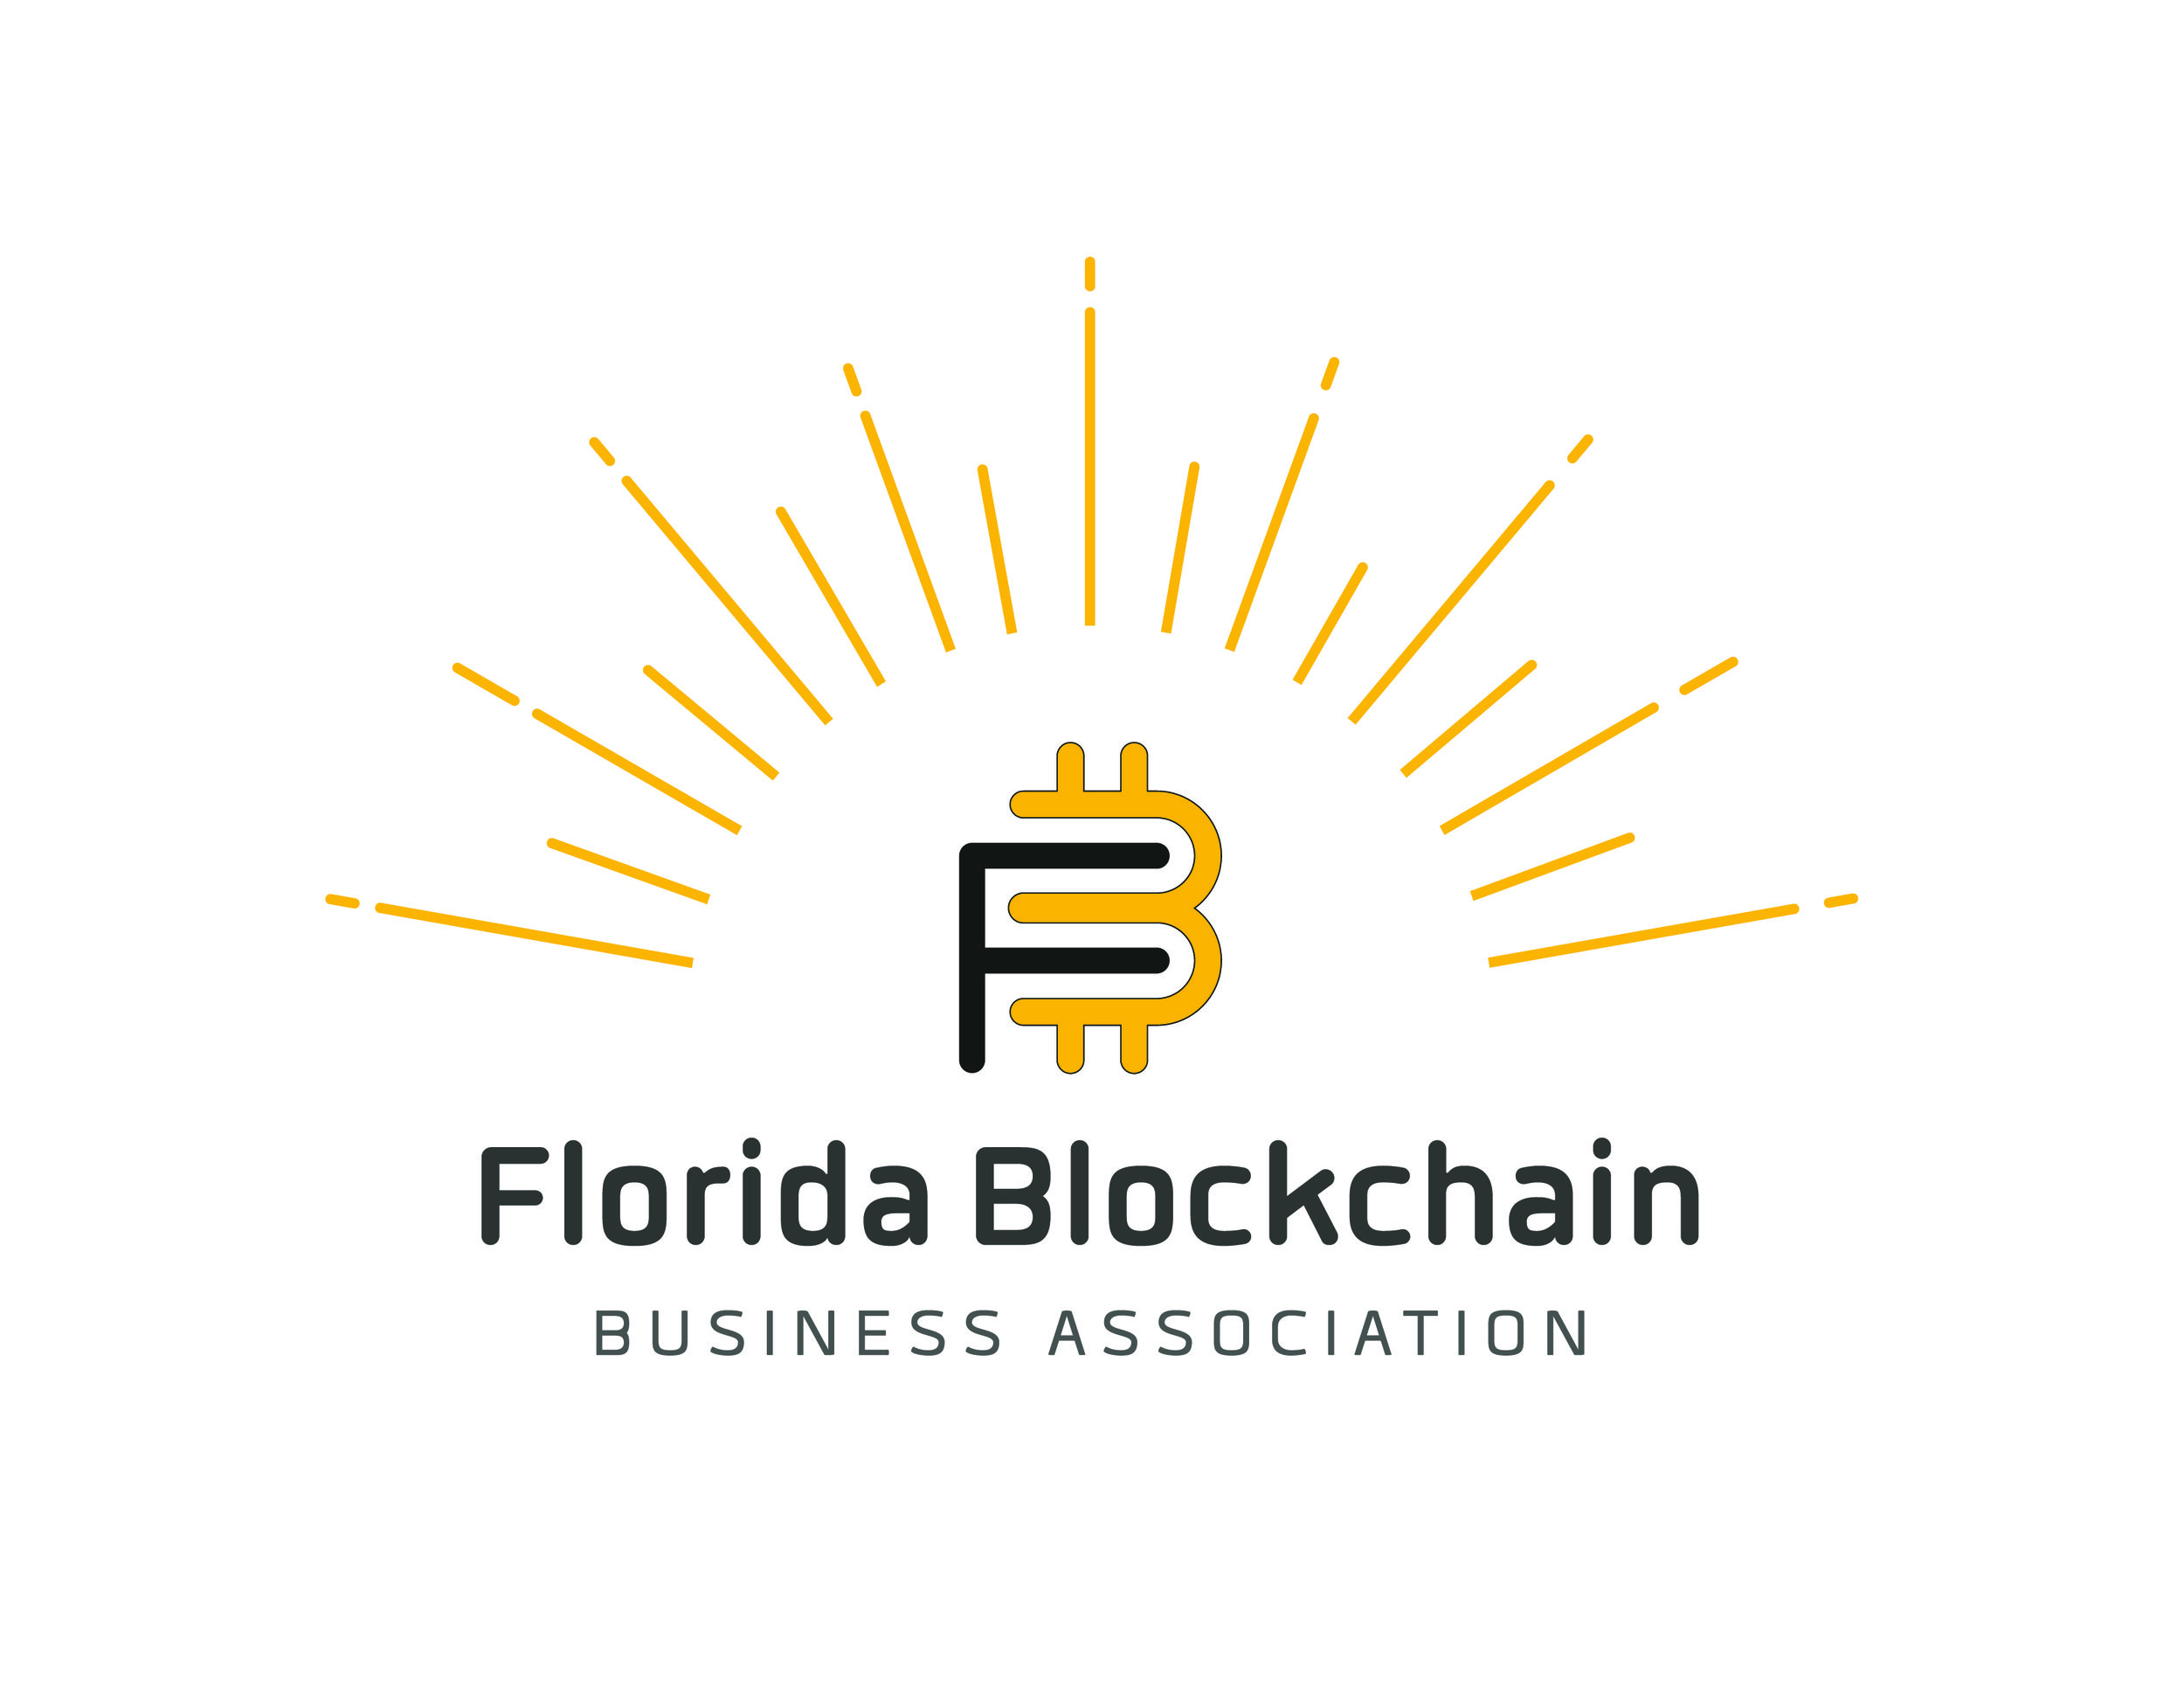 Florida Blockchain Business Association_FF_02.jpg